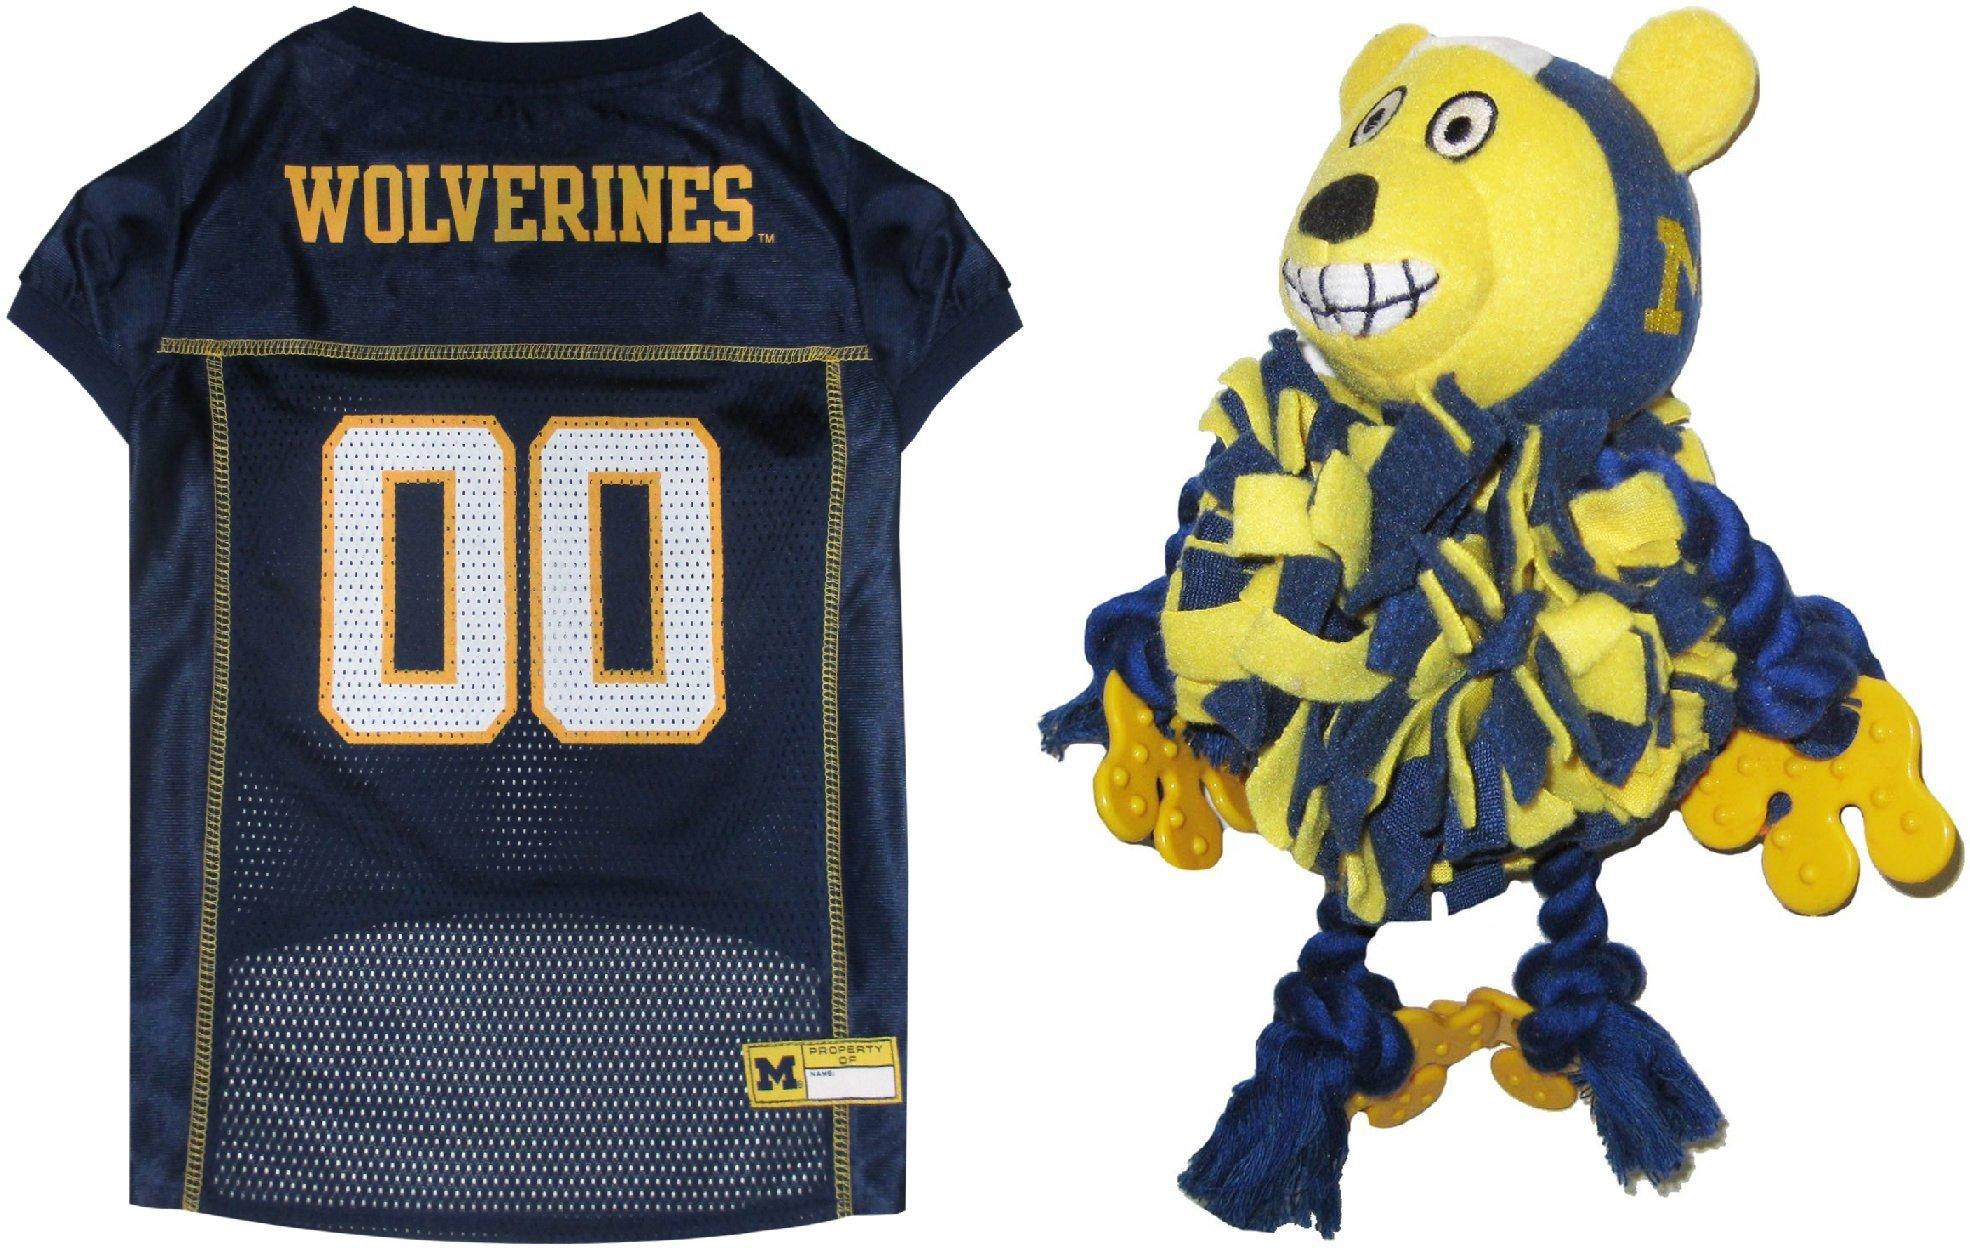 Michigan Wolverines Pet Pom Pom Toy & Pet Jersey Bundle, Small. - WOLVERINES Dog Jersey & Pom Pom Dog Toy